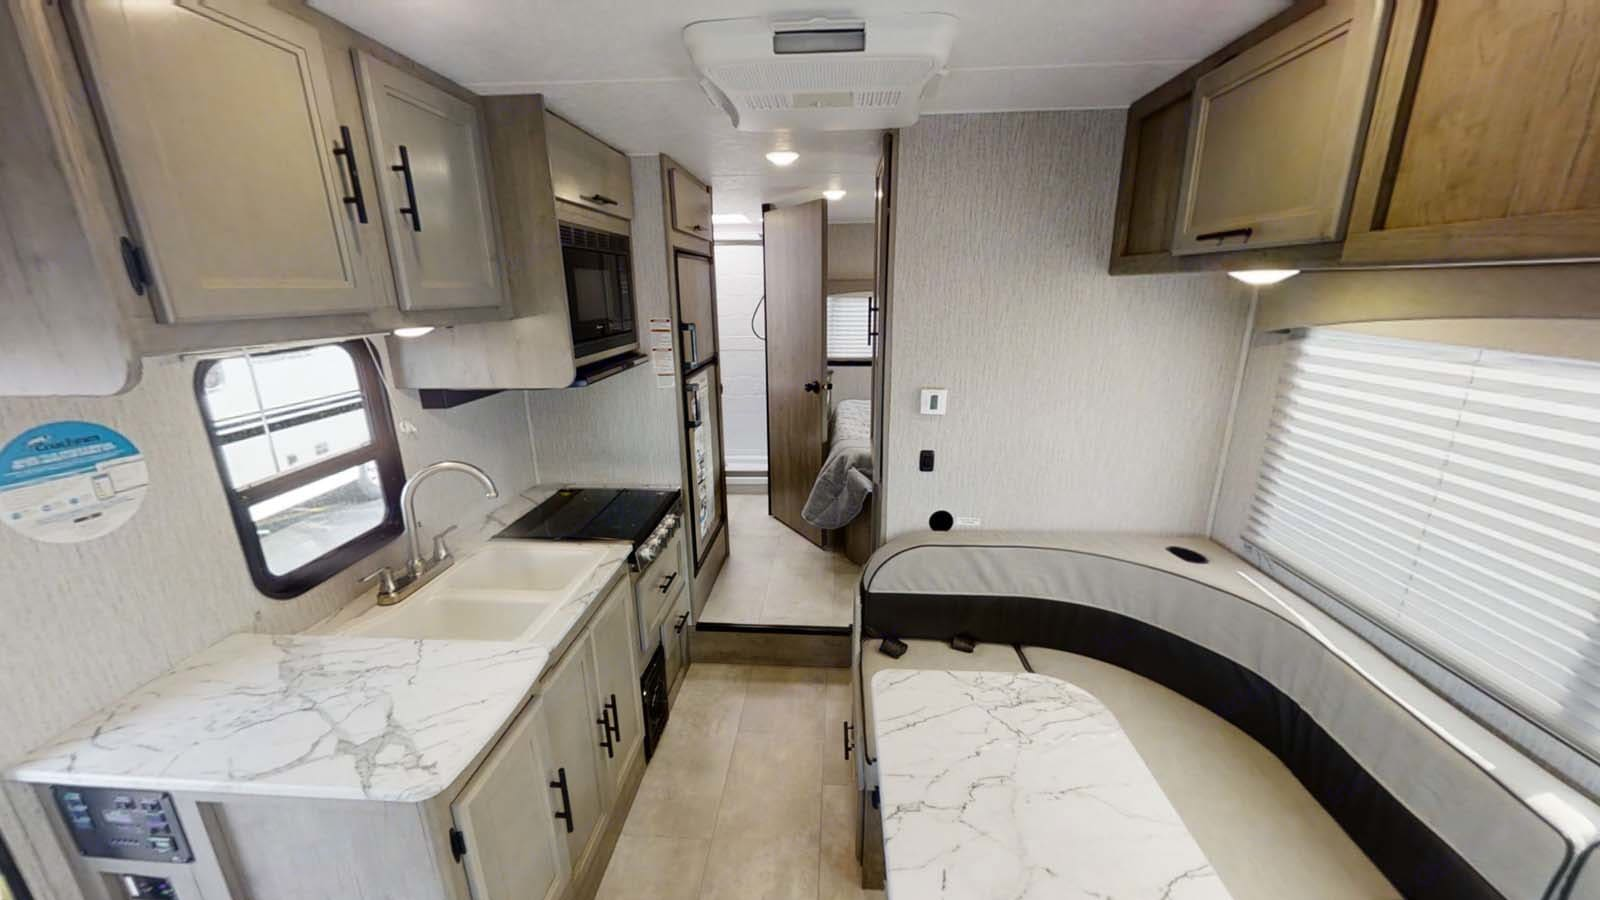 dining area with kitchen. Coachmen Freelander 2021